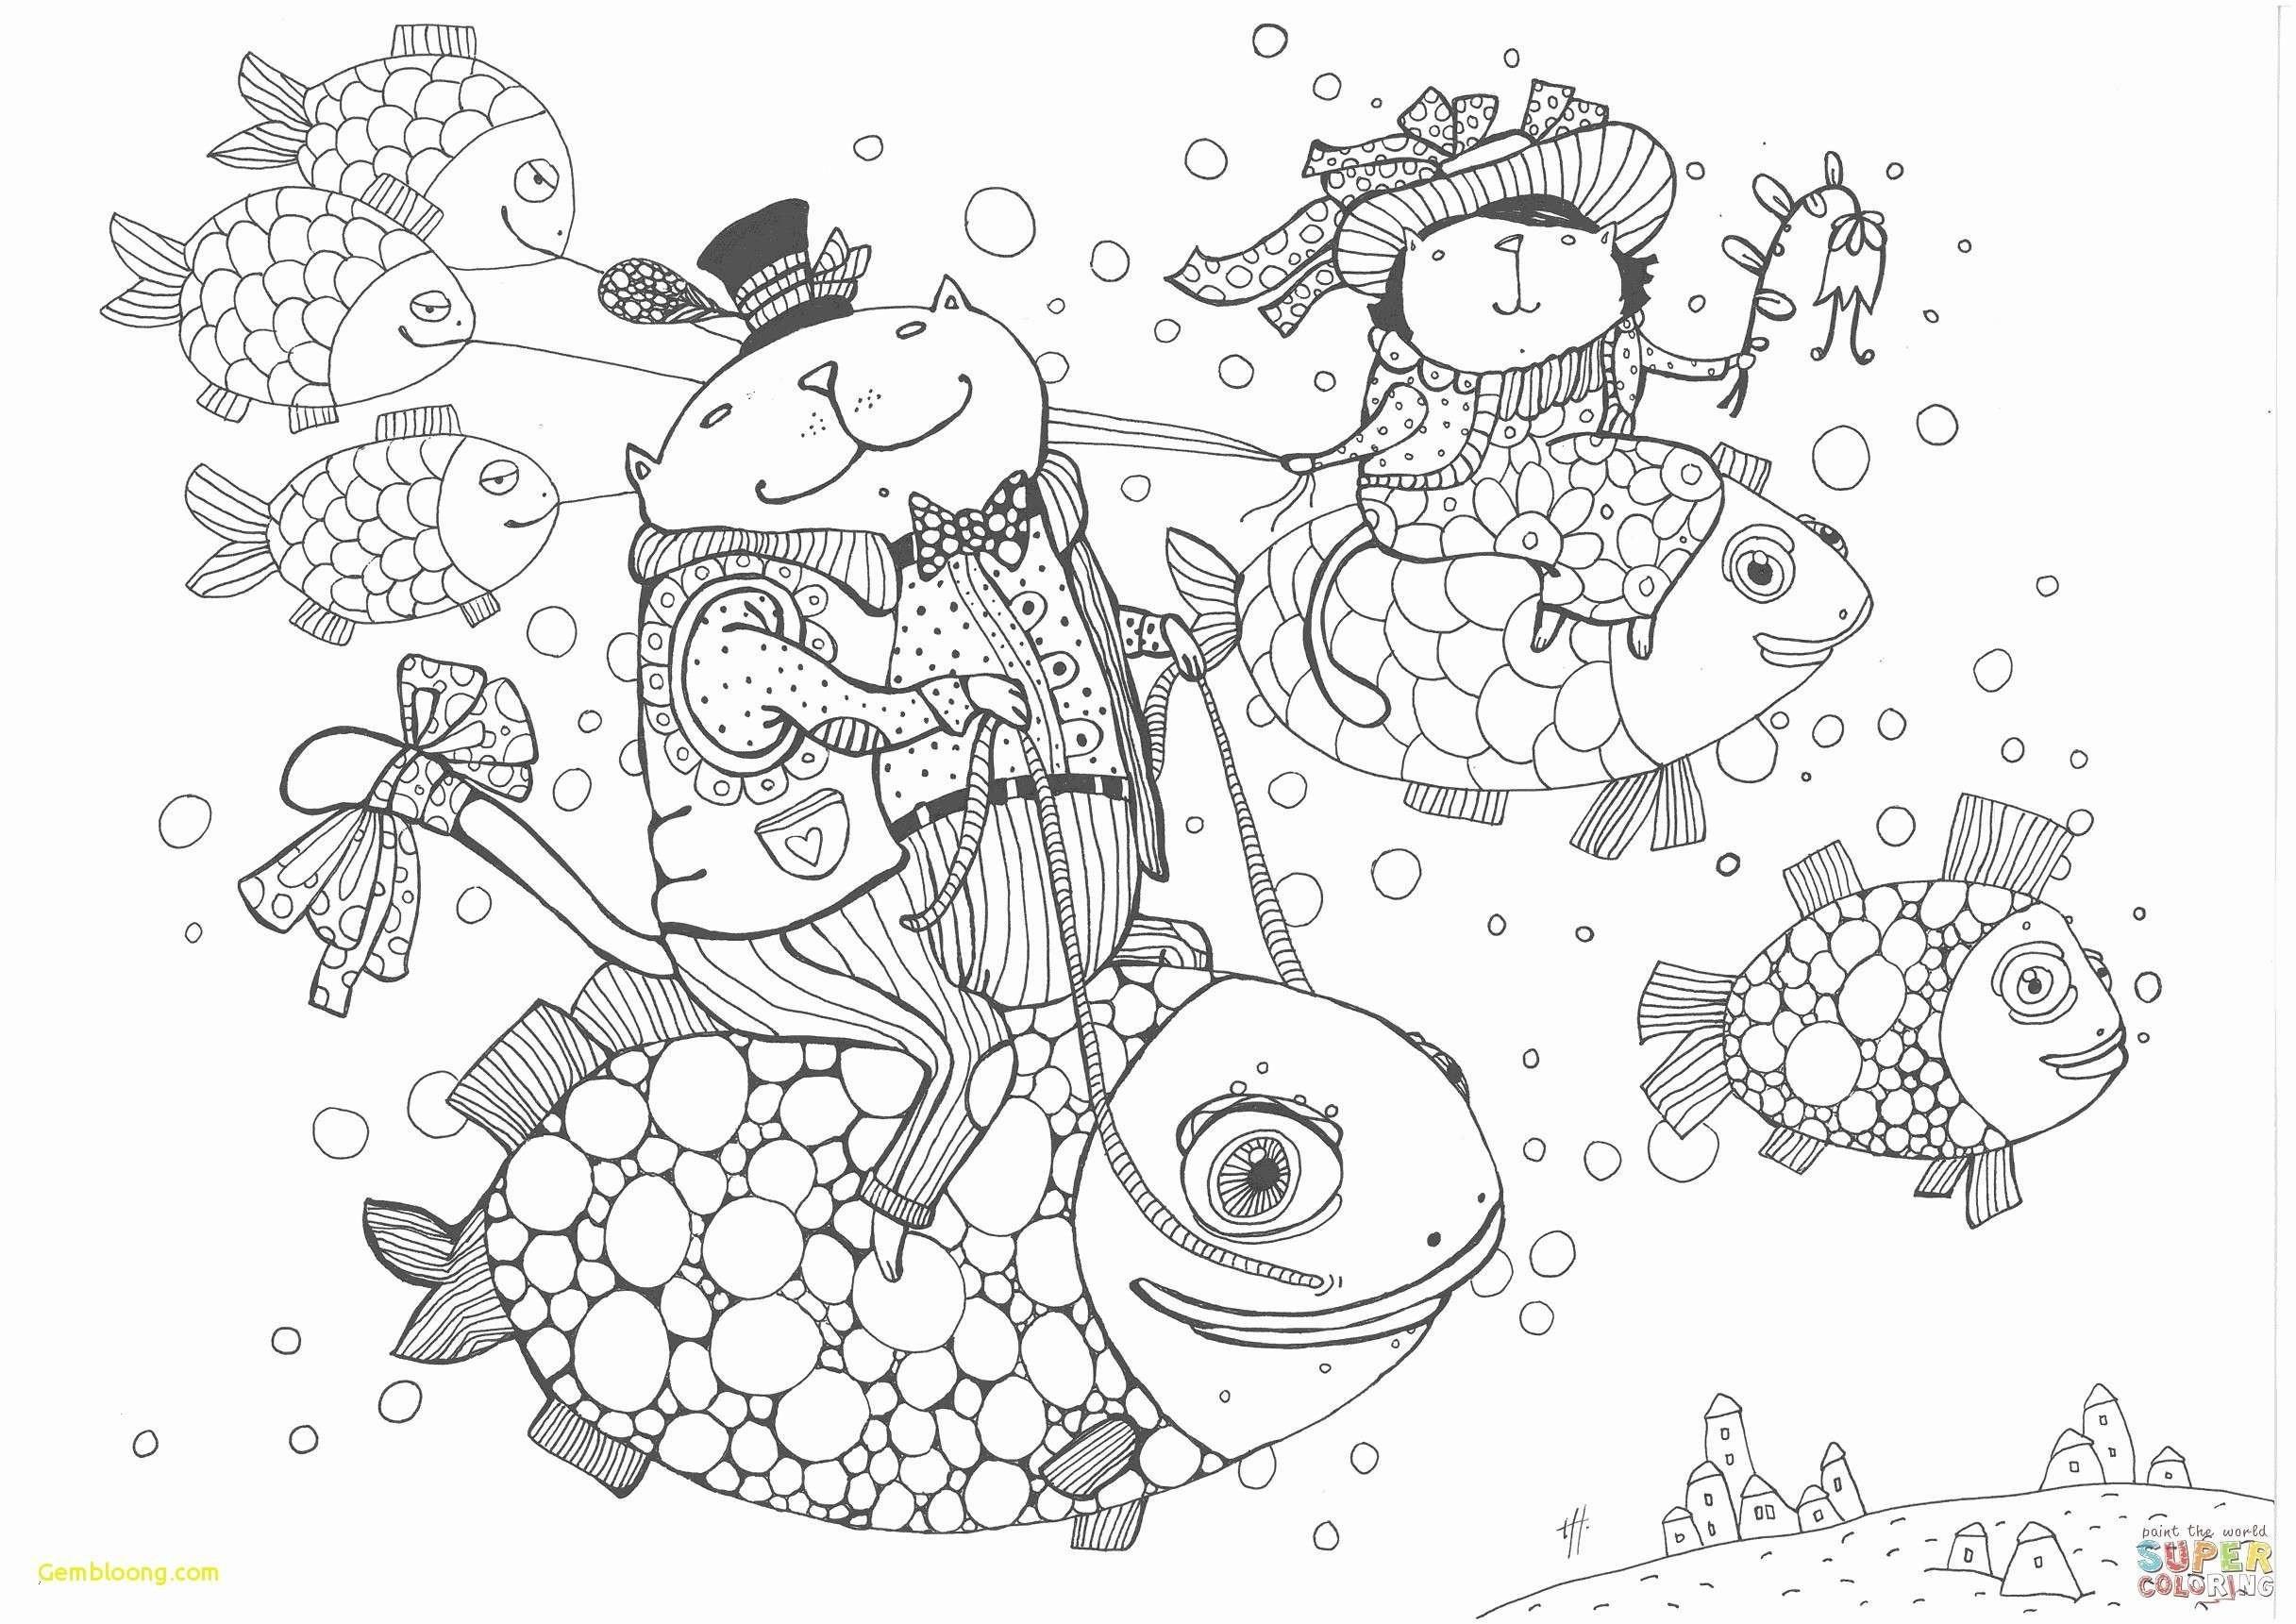 Pippi Langstrumpf Ausmalbilder Genial 37 Malvorlagen Feen Scoredatscore Neu Ausmalbilder Elfen Und Feen Stock